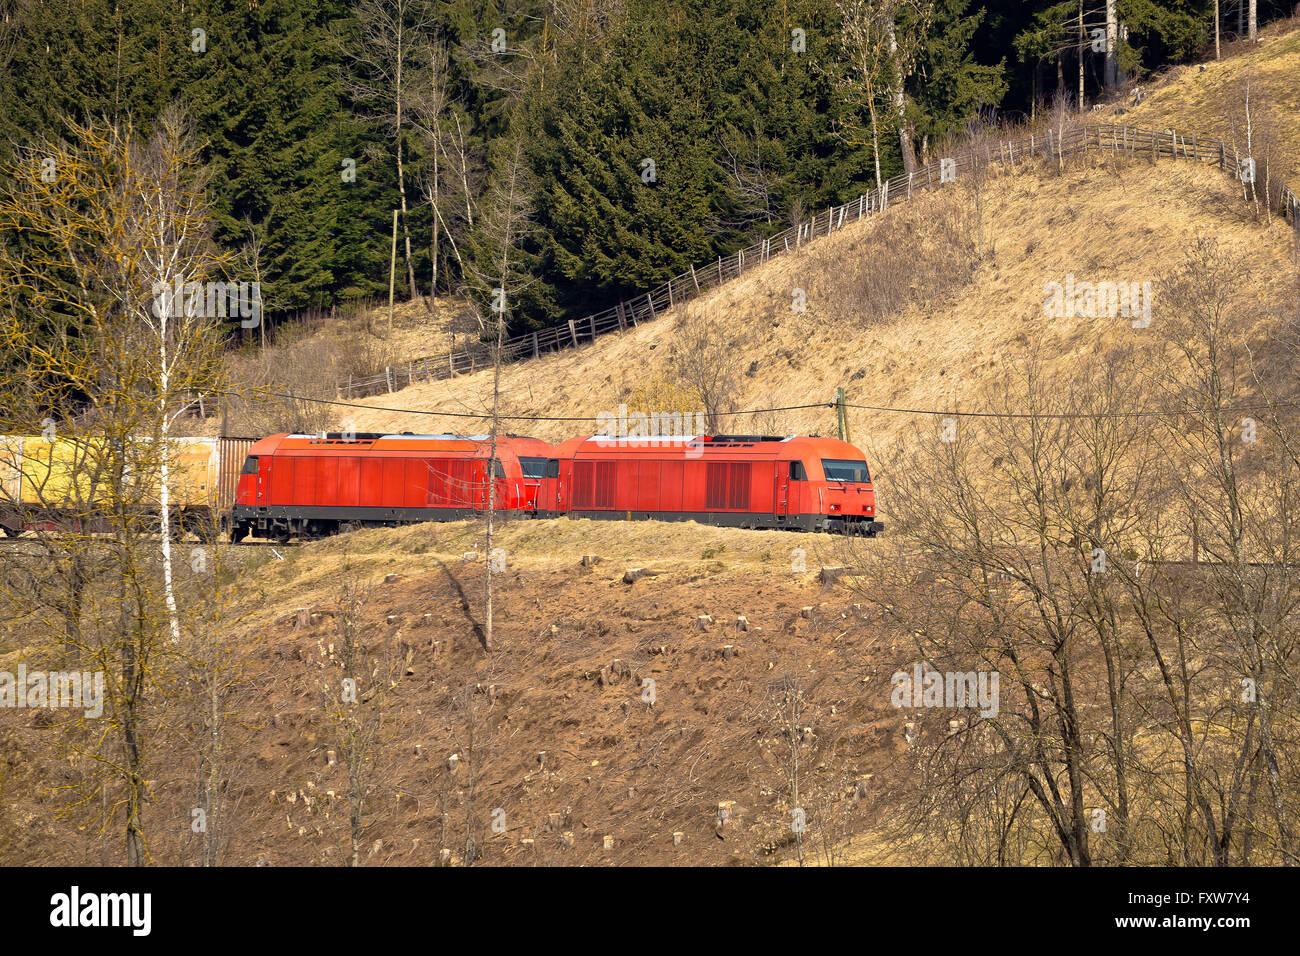 Austrian railways OBB train in nature, Carinthia, Austria - Stock Image